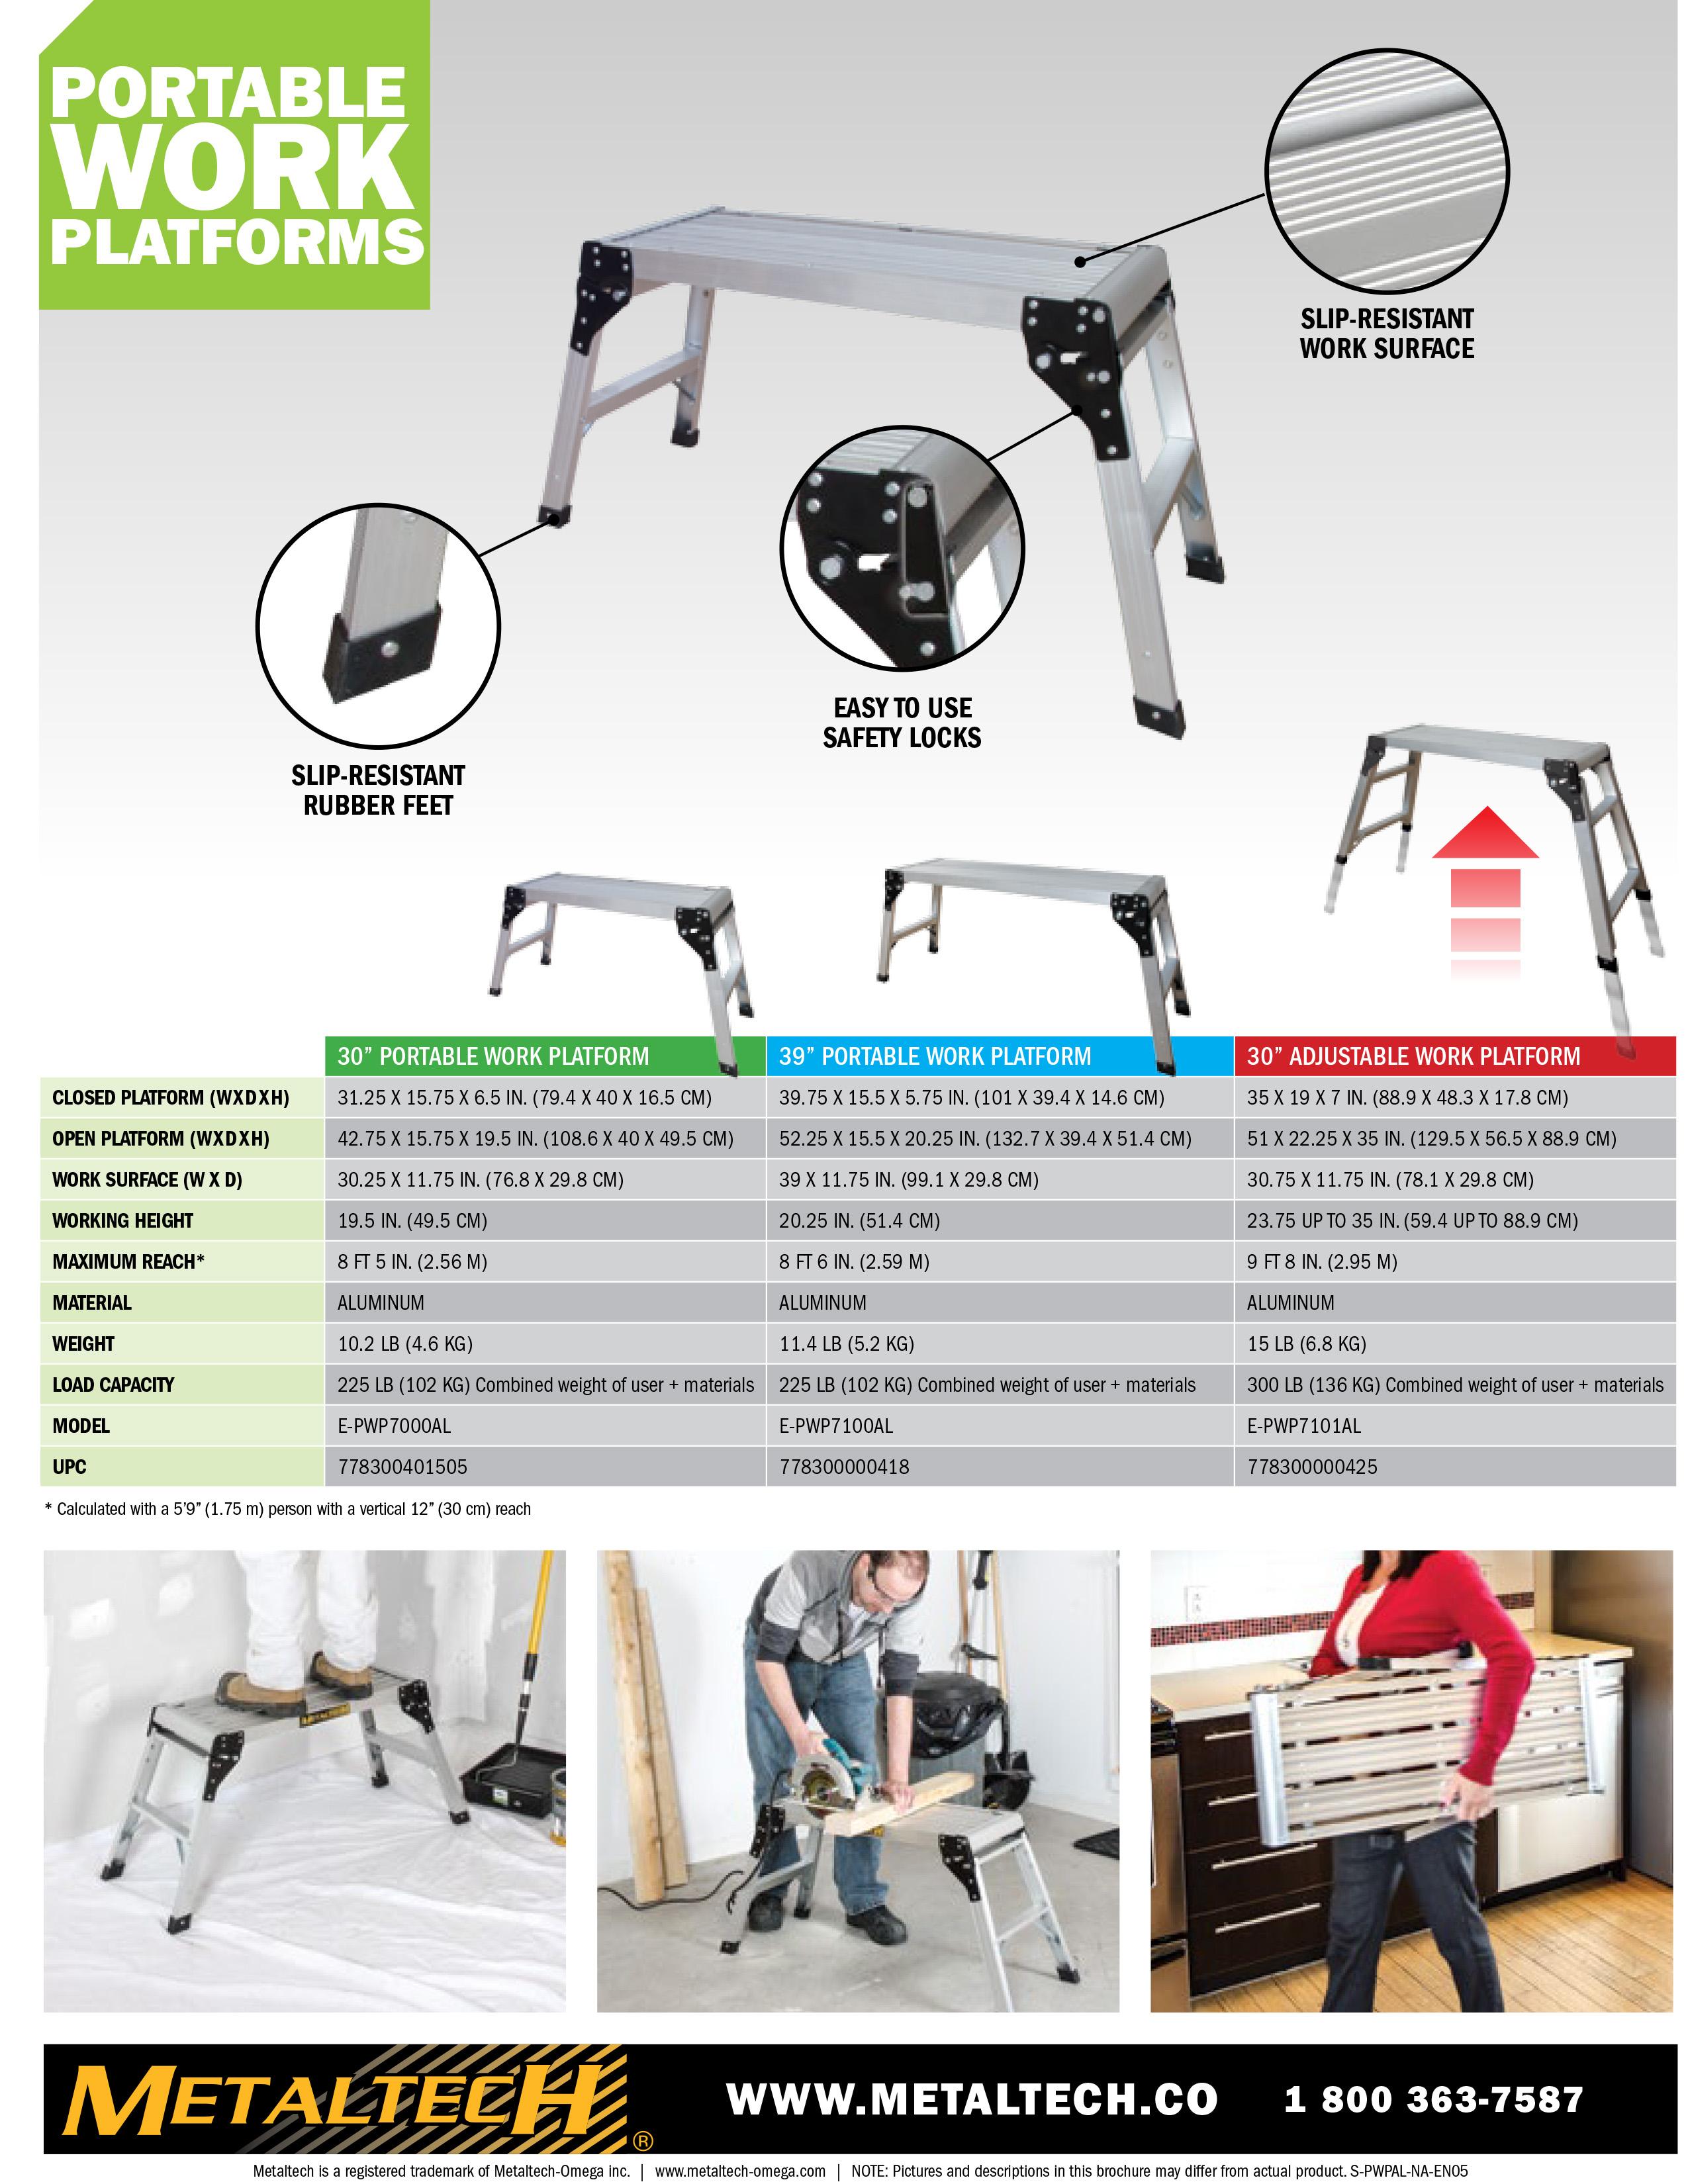 metaltech-portable-work-platform-2.jpg